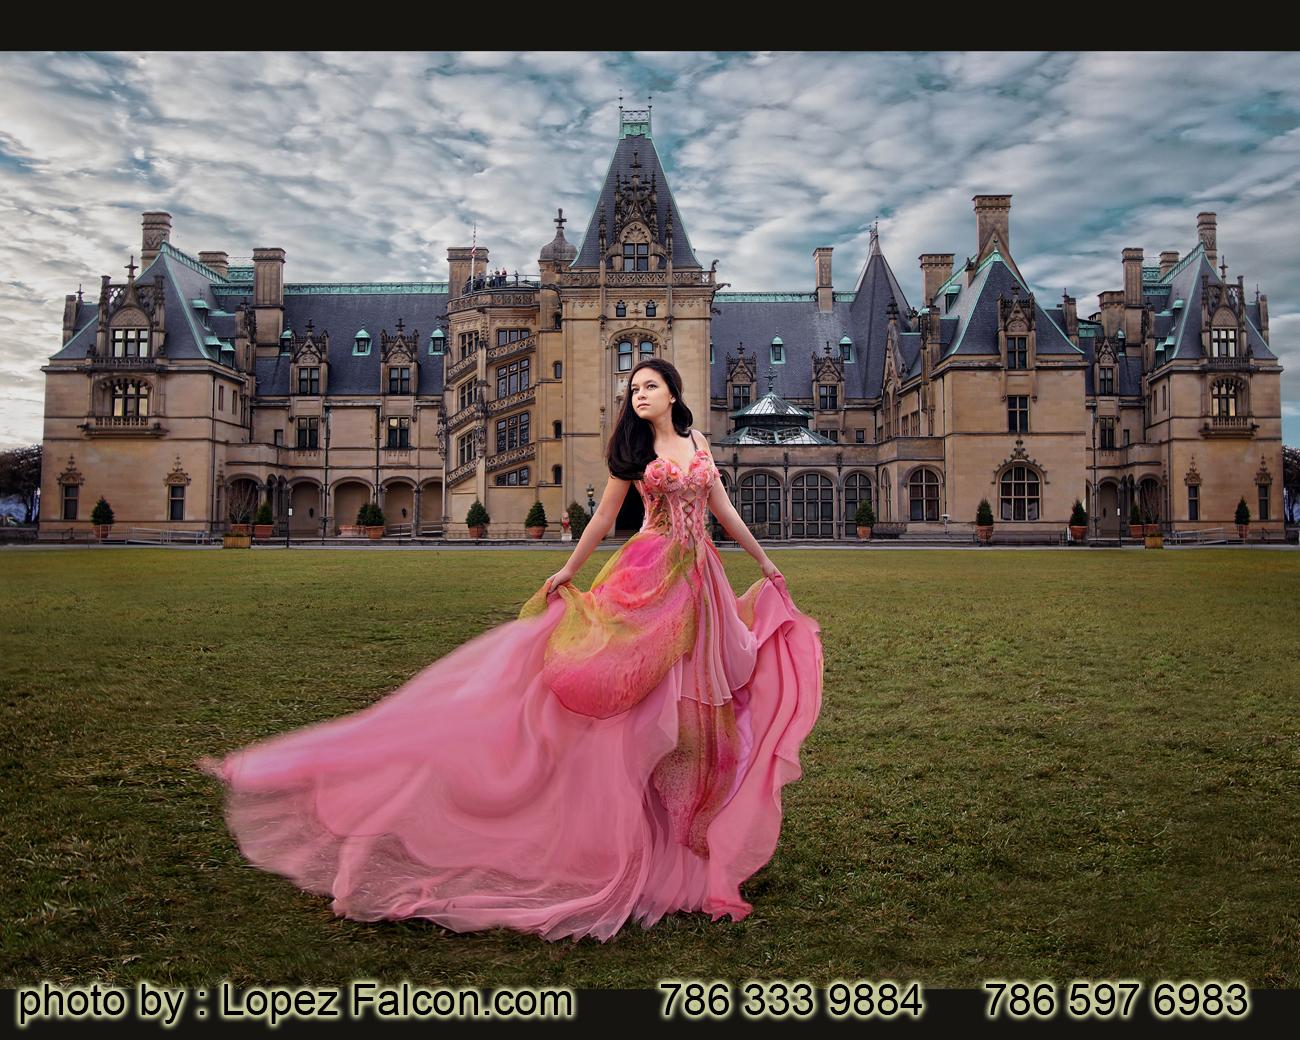 64fcd14f713 ... Dress Venetian Fontainebleau Miami Party · Villa Toscana Miami Quinces  Photography Quinceanera. Lopez Falcon Photography Quince Miami